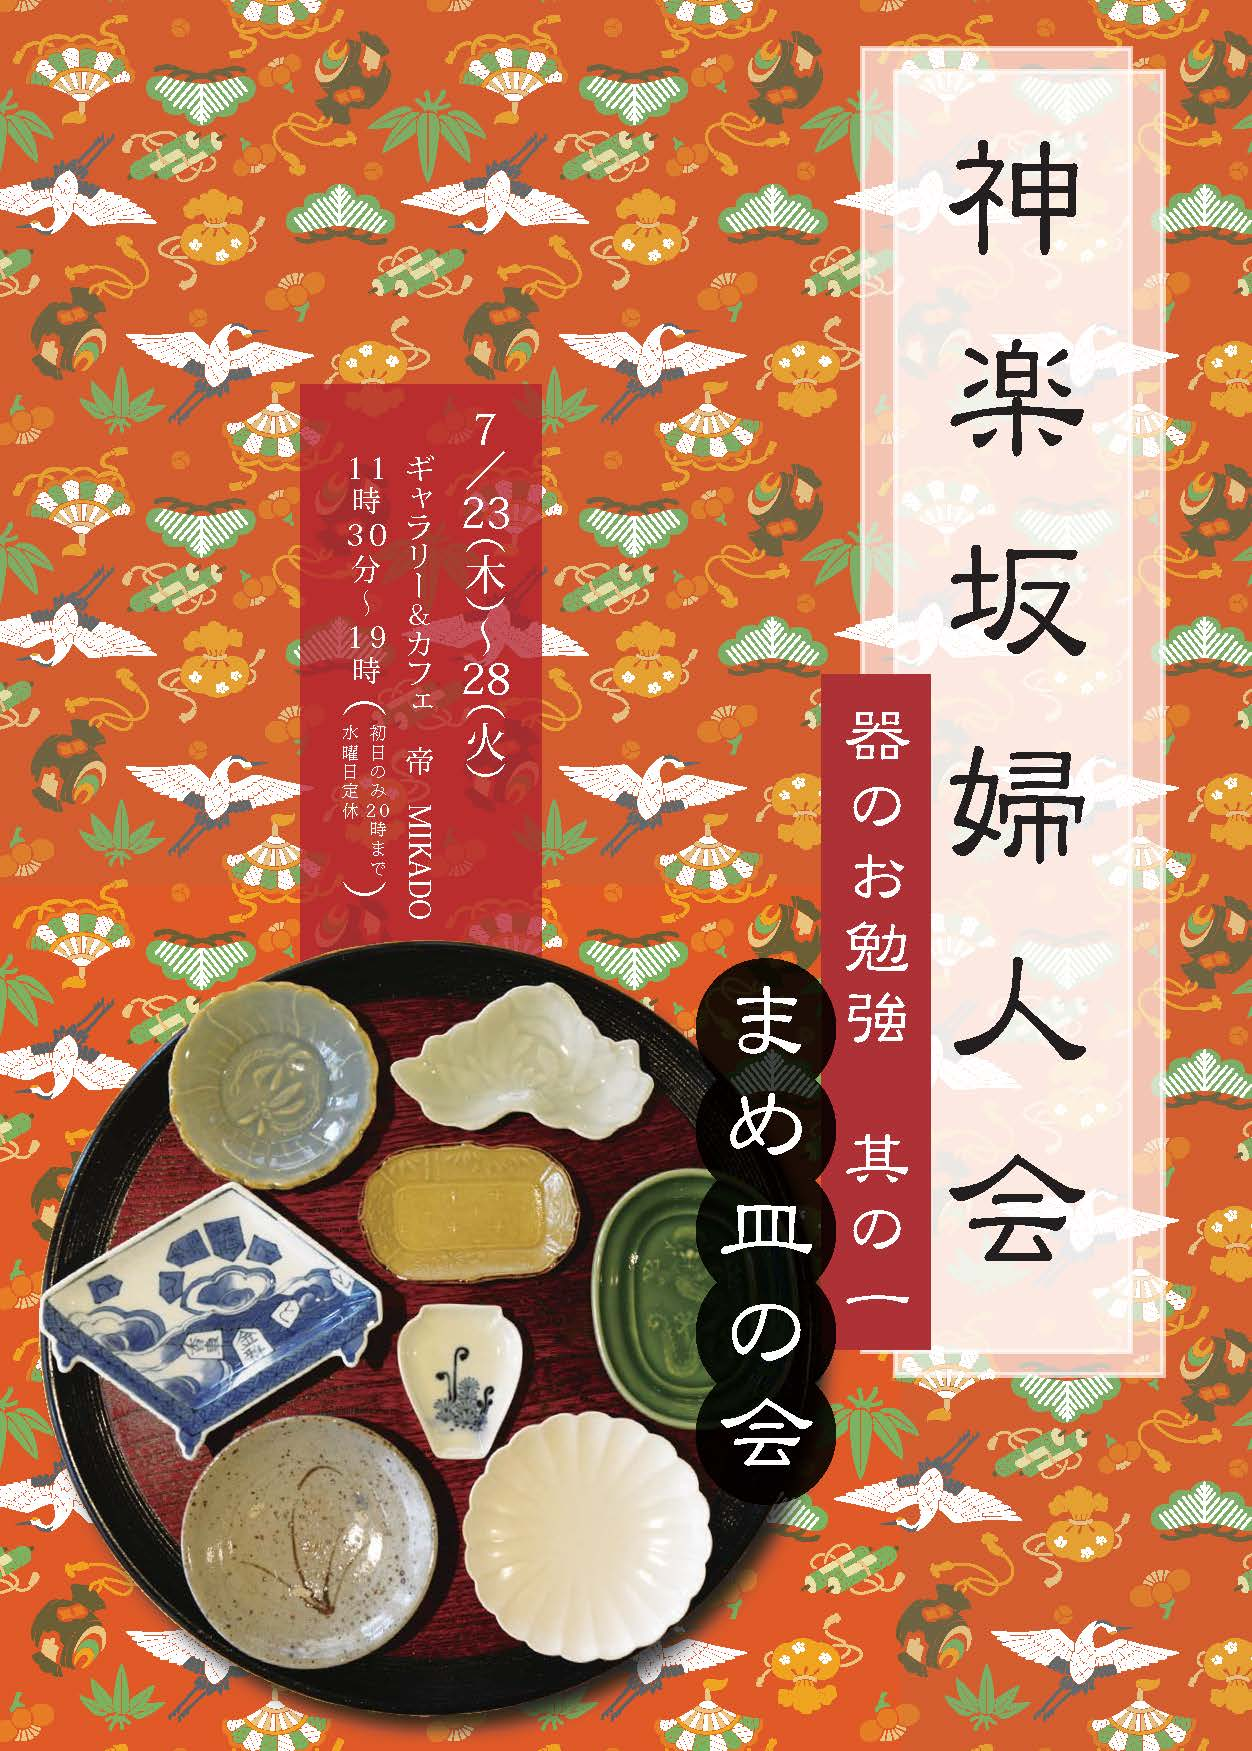 fujinkai_01